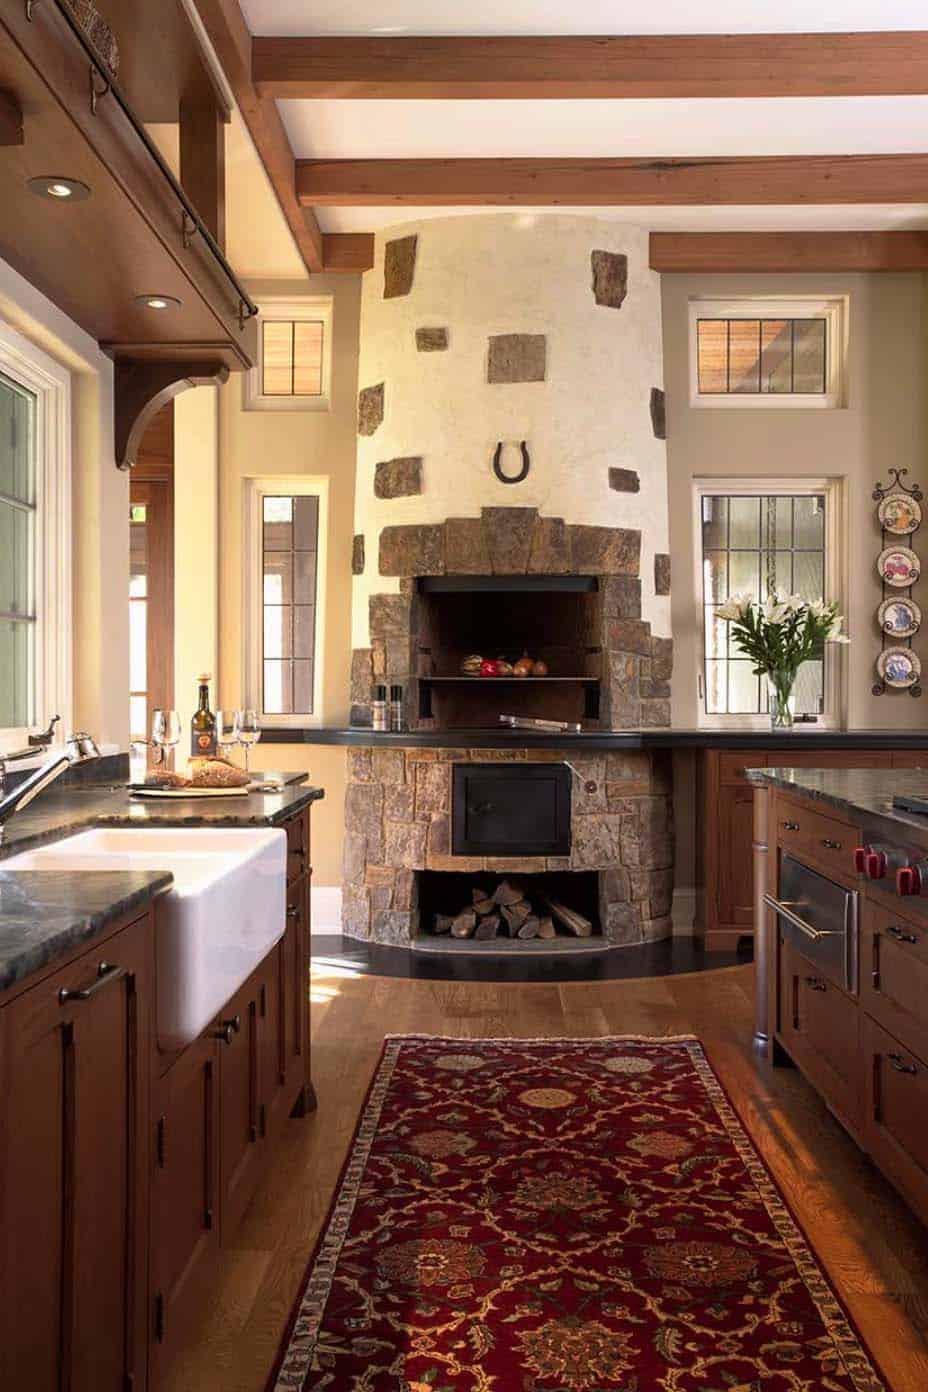 Kitchen Showcasing Cozy Fireplace-02-1 Kindesign